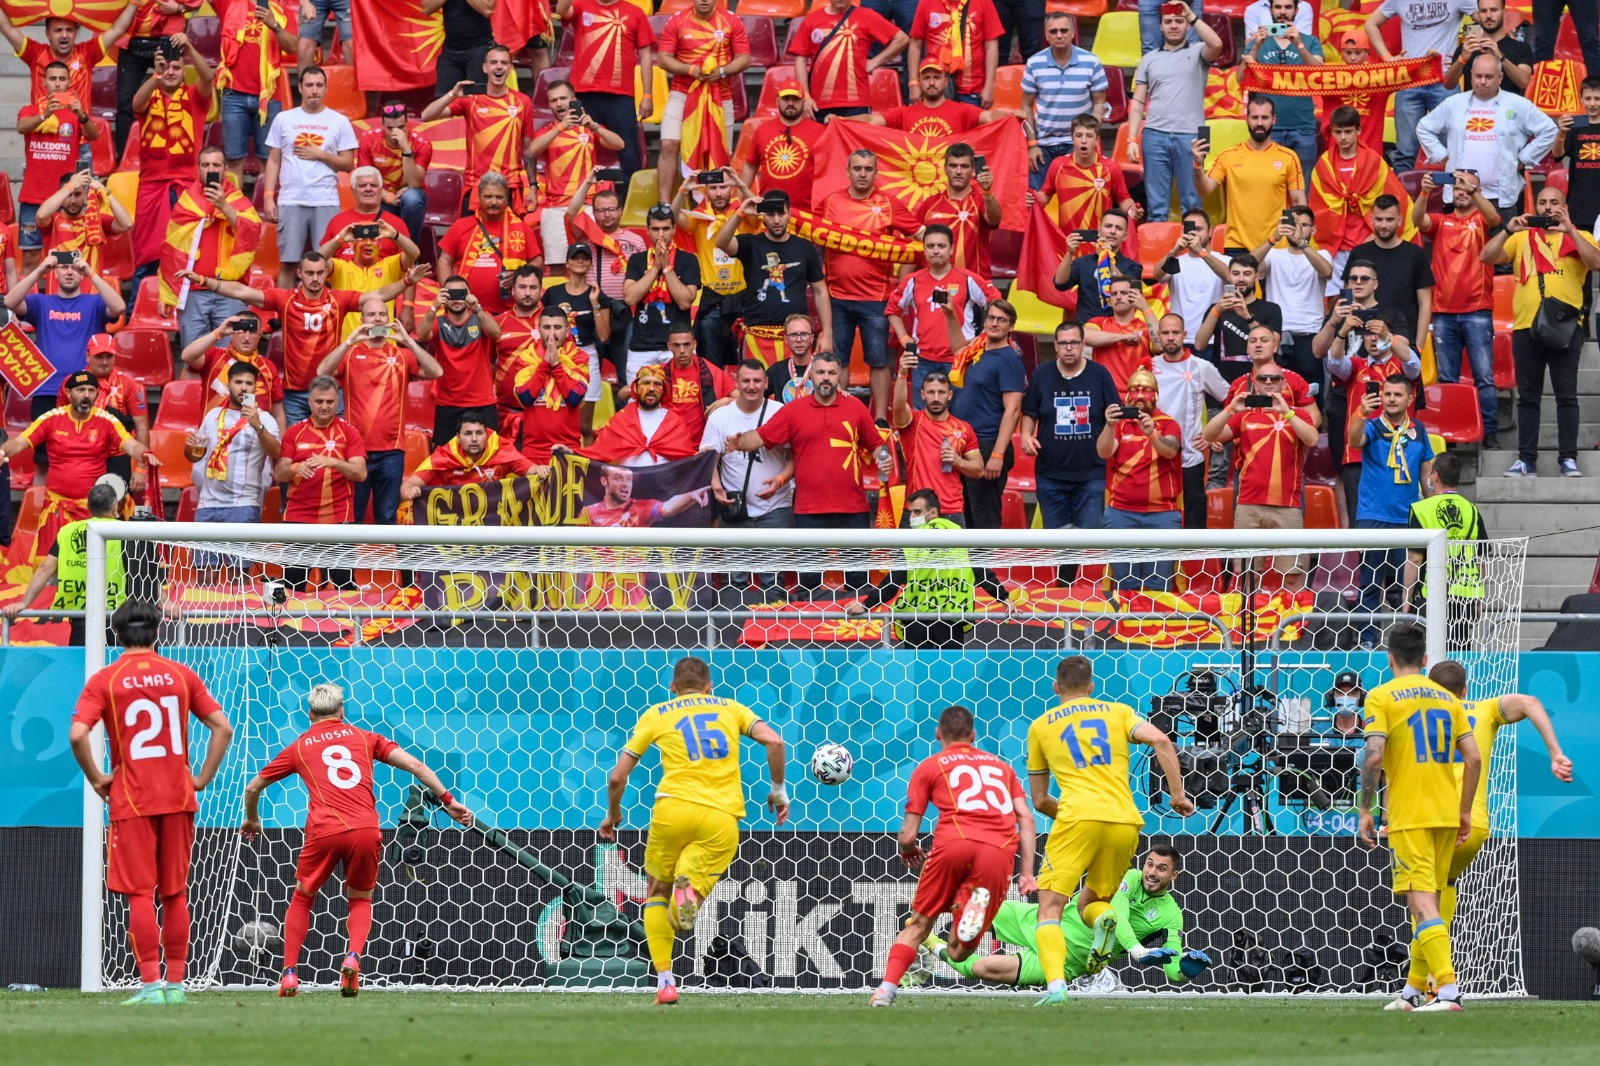 EURO 2020. Ucraina – Macedonia de Nord 2-1. Ambele echipe au ratat câte un penalty